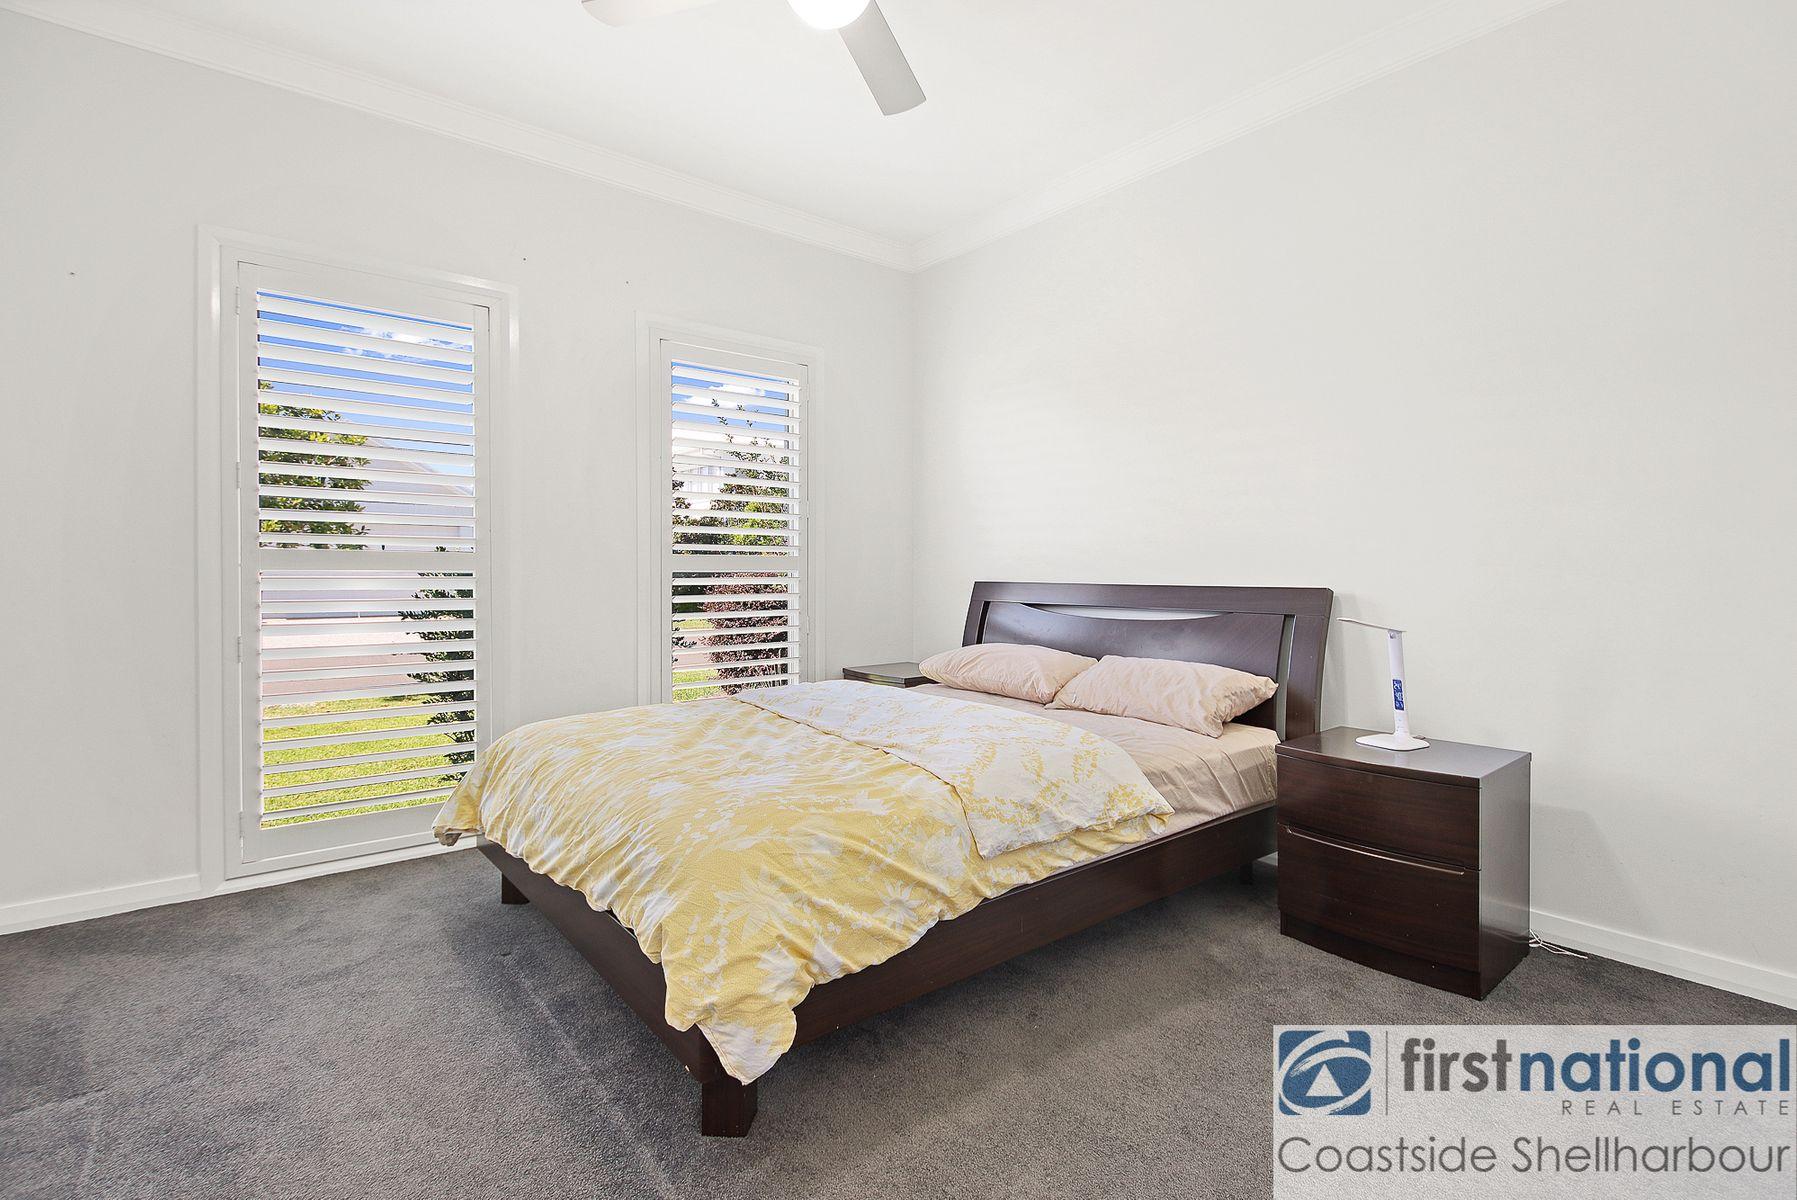 5 Vines Avenue, Shell Cove, NSW 2529